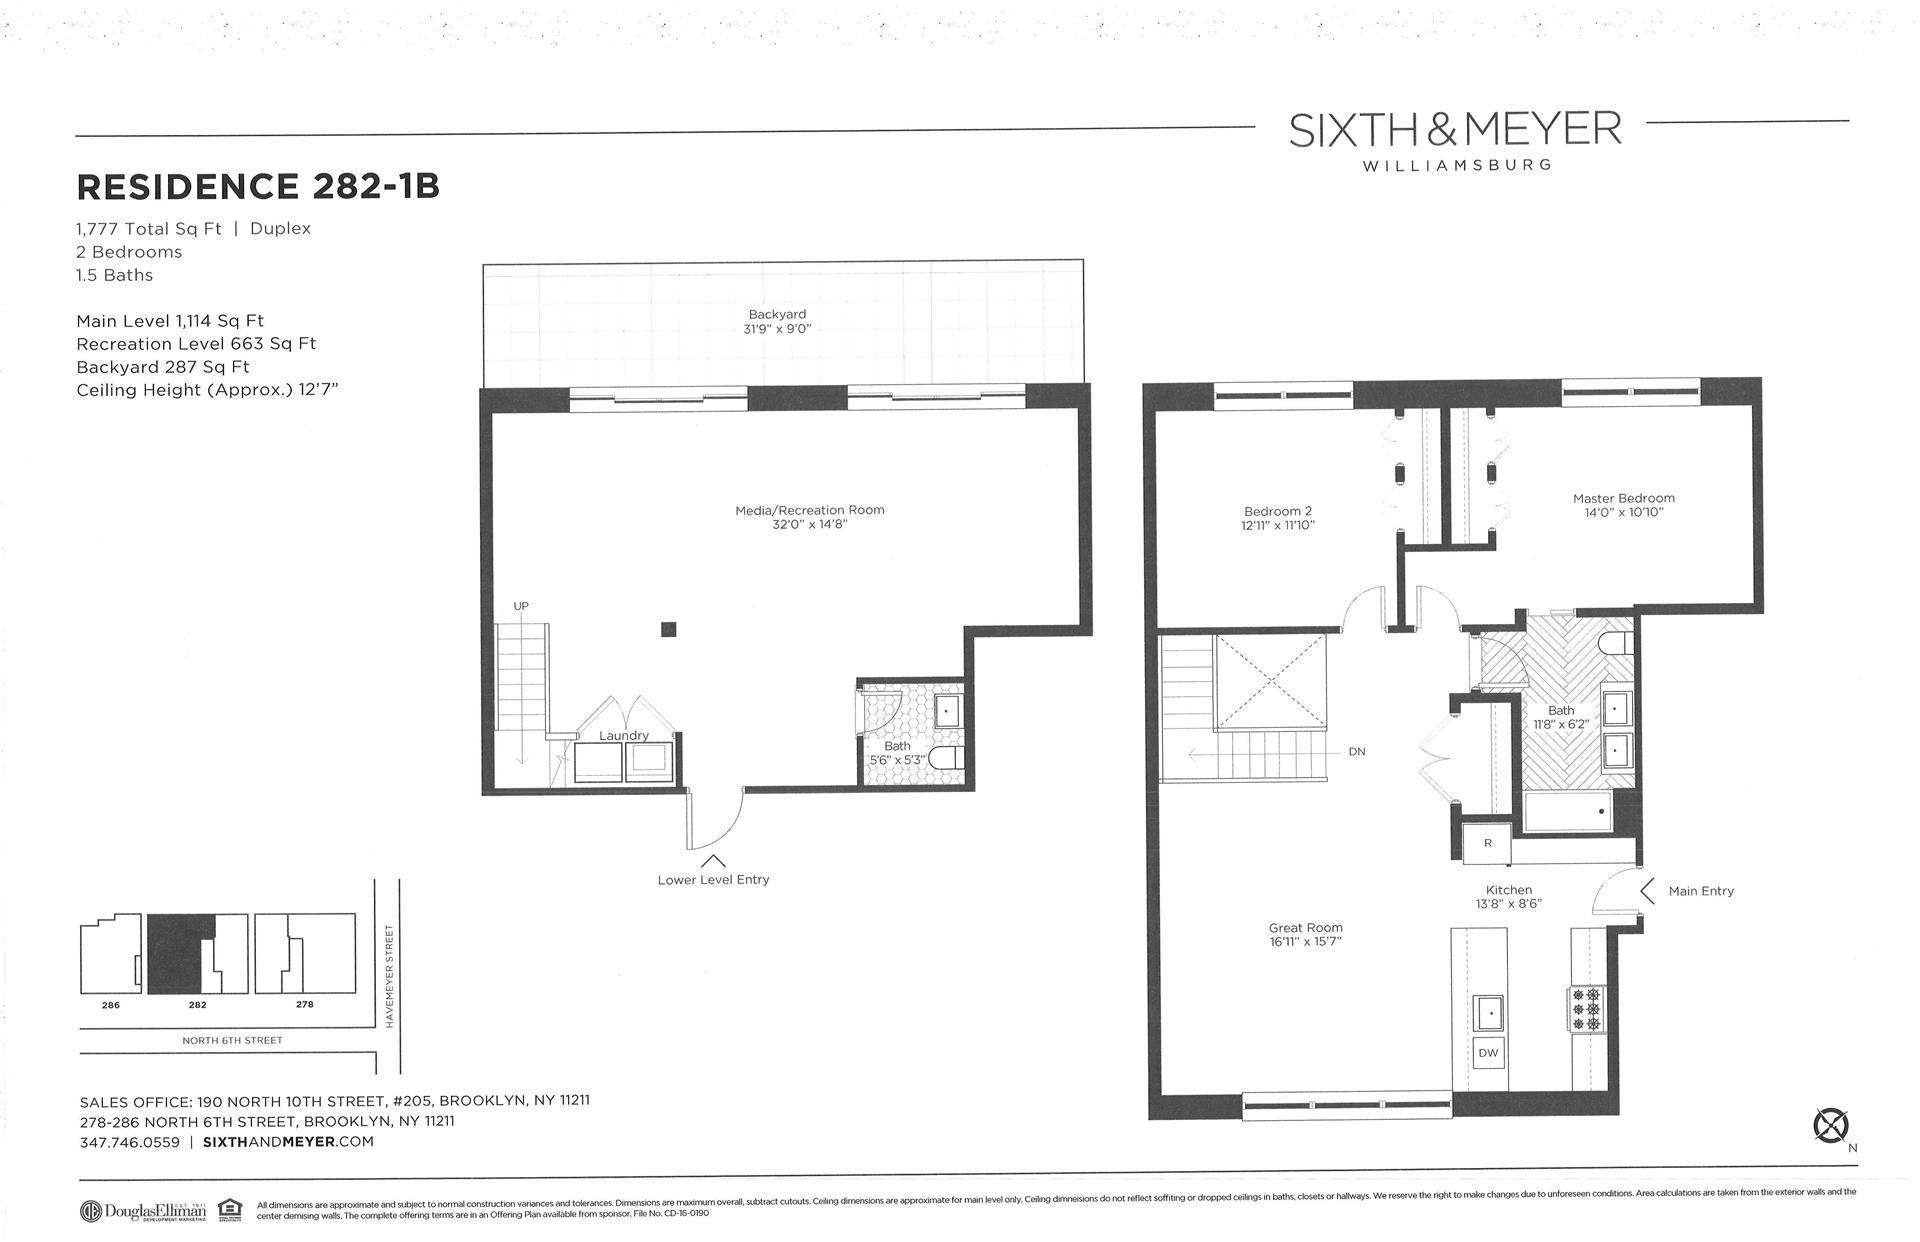 Floor plan of Sixth & Meyer, 278-286 North 6th St, 282/1B - Williamsburg, New York